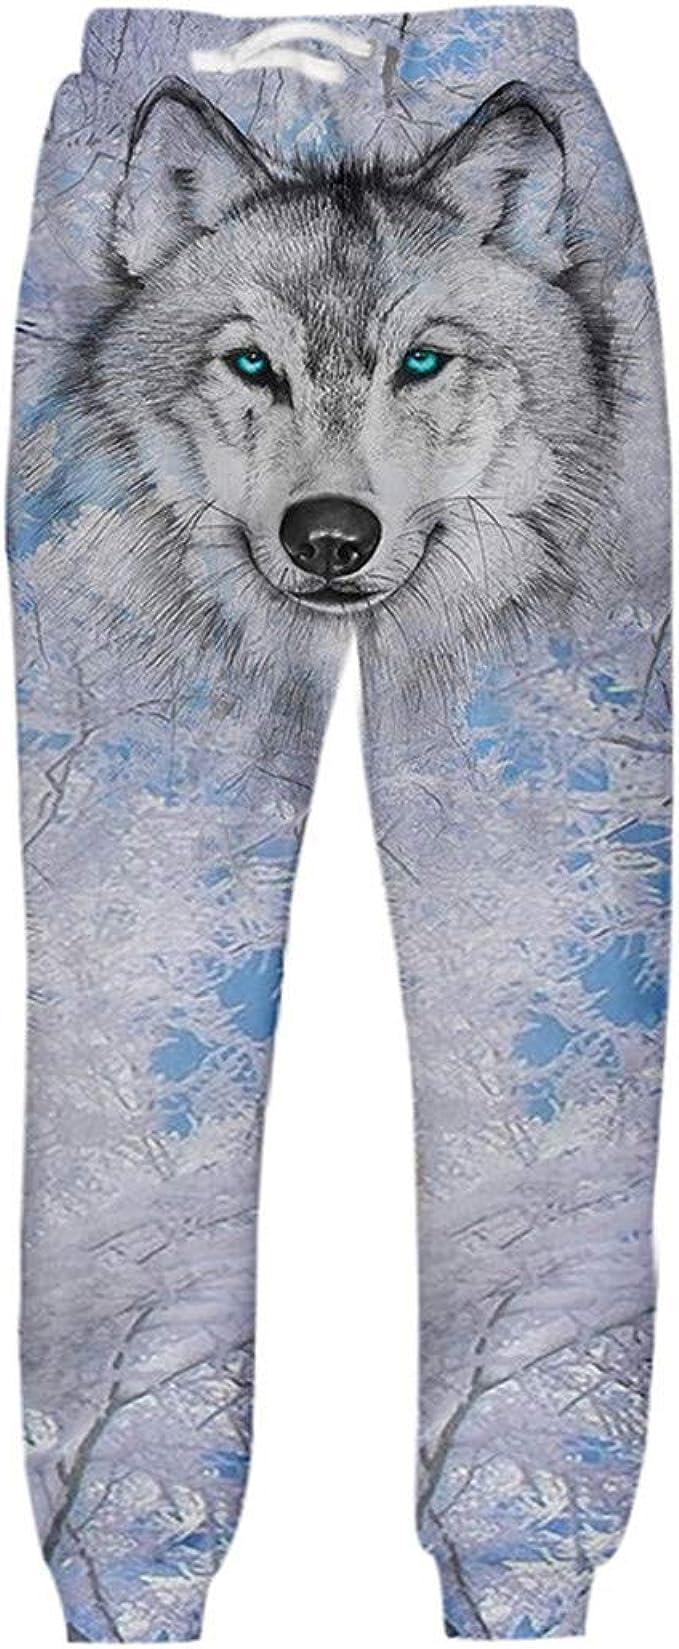 Pantalones de chándal de Longitud Completa para Hombres Pantalón ...